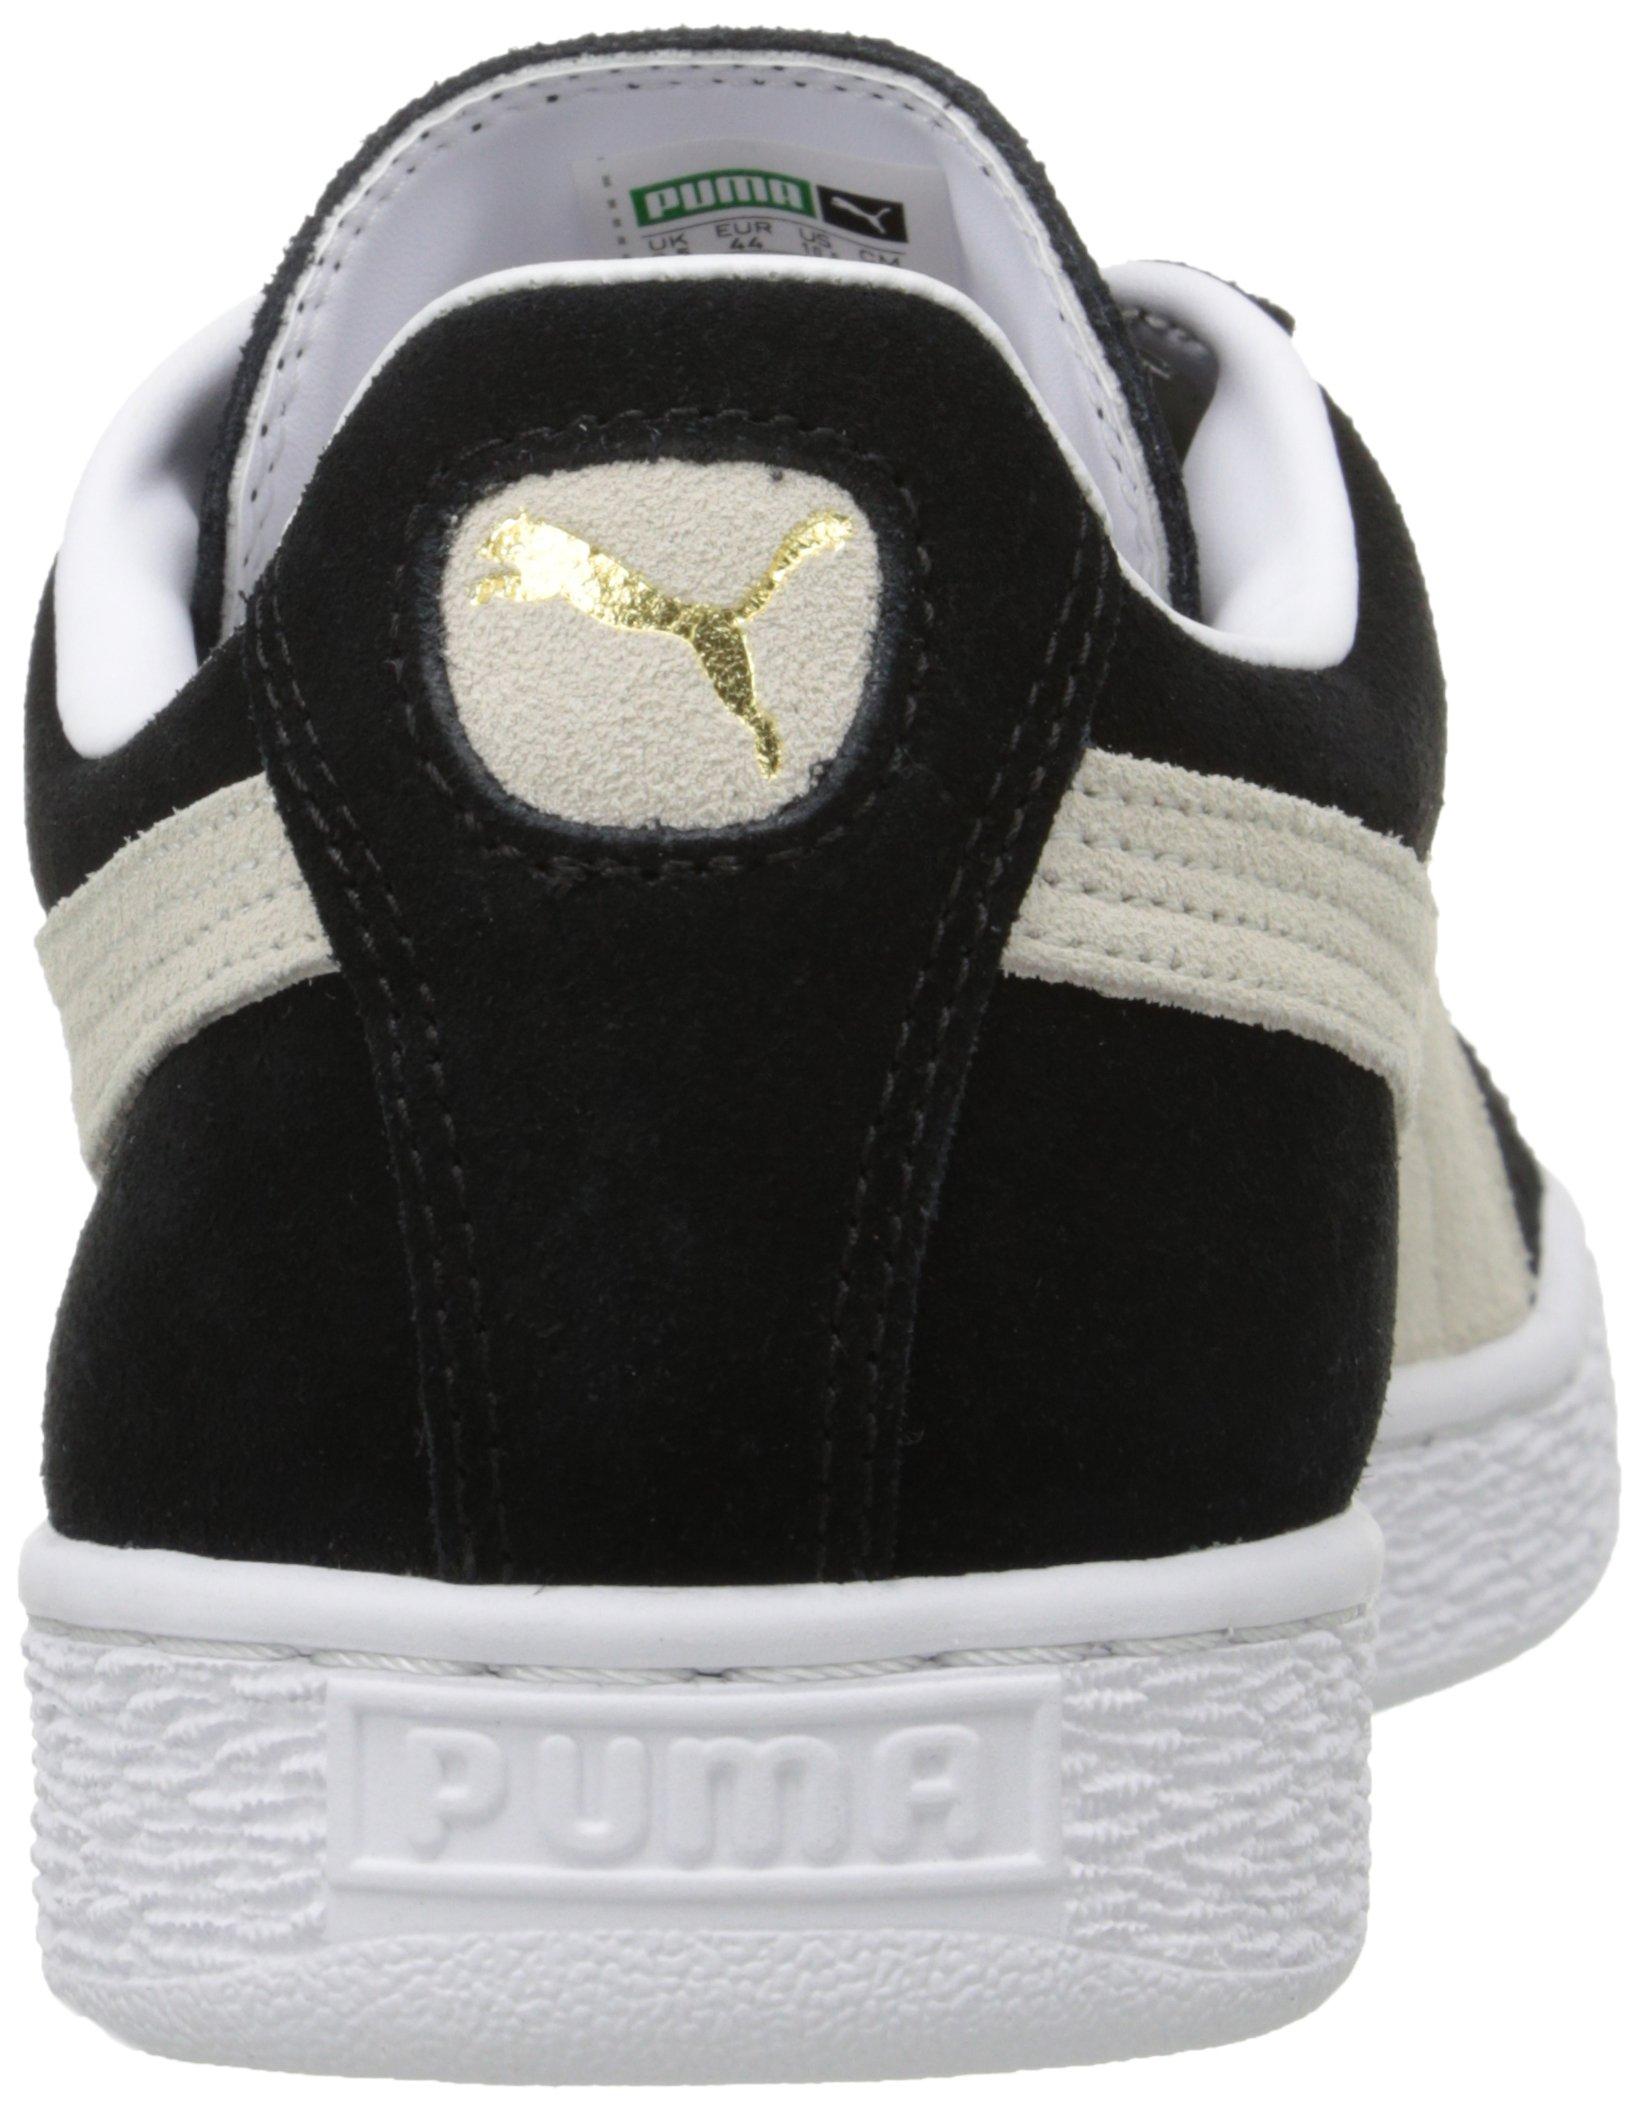 PUMA Suede Classic Sneaker,Black/White,9.5 M US Men's by PUMA (Image #9)